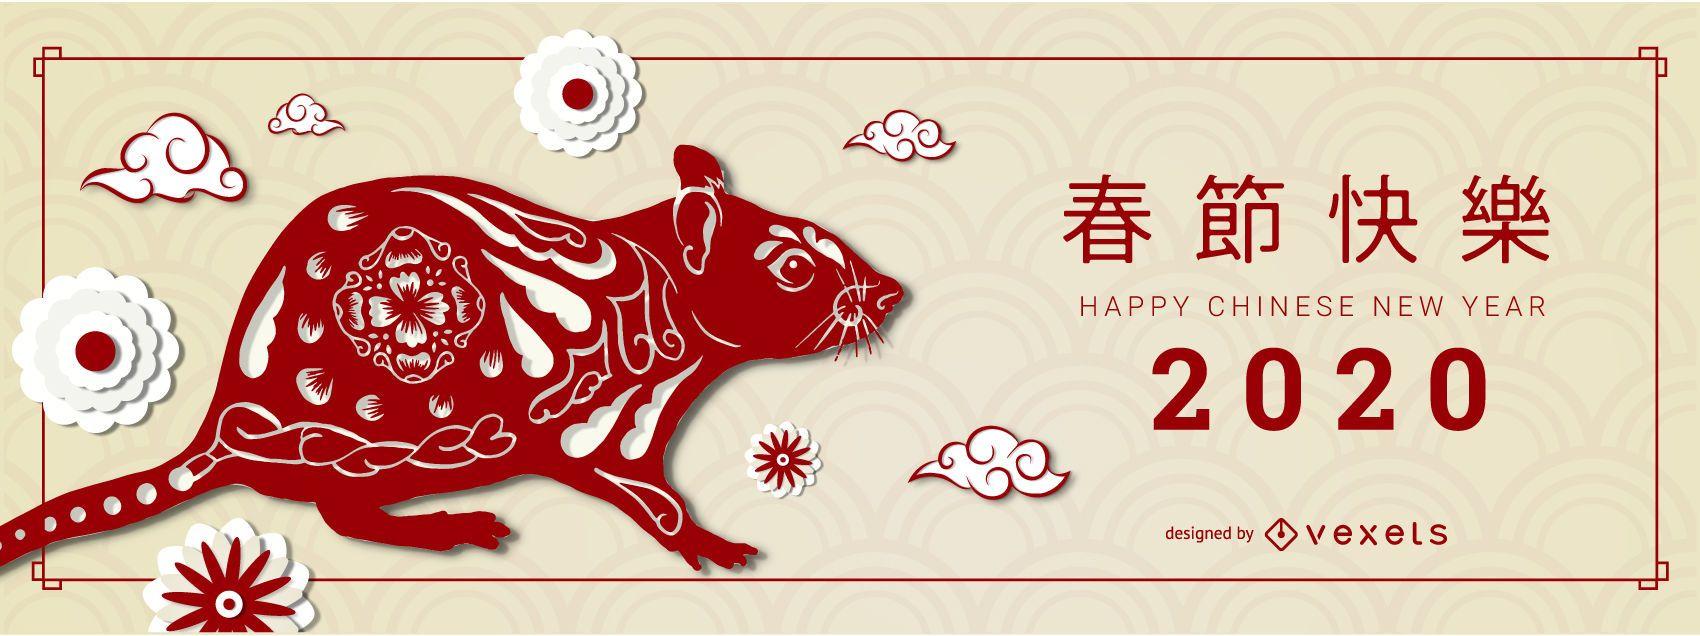 Banner de rata del año nuevo chino 2020